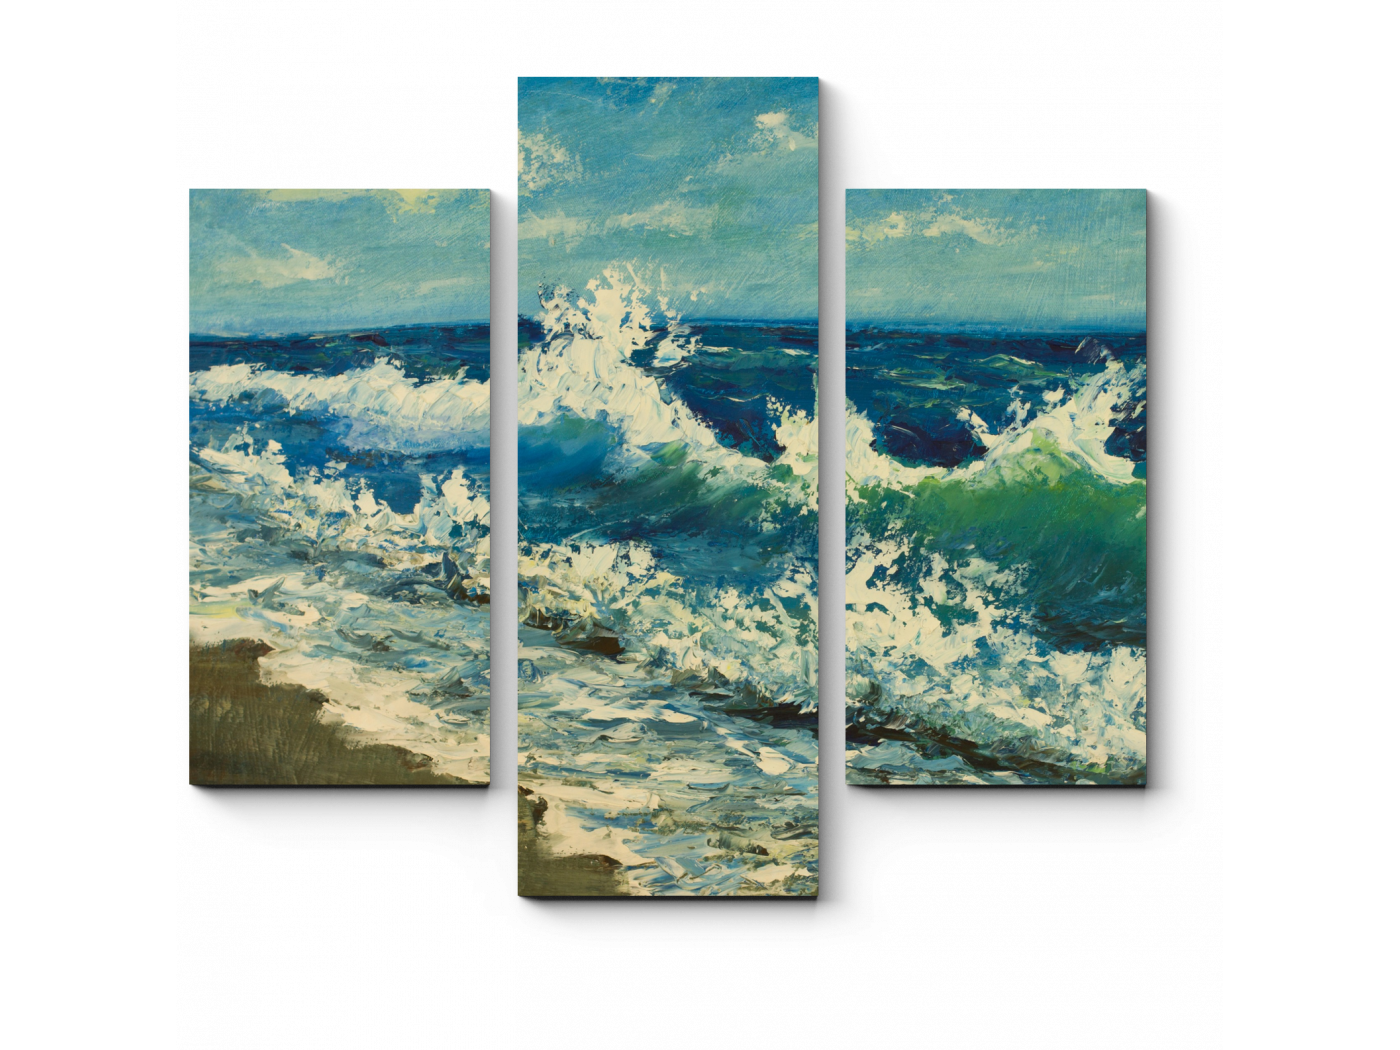 Модульная картина Море импрессионизма (60x54) фото